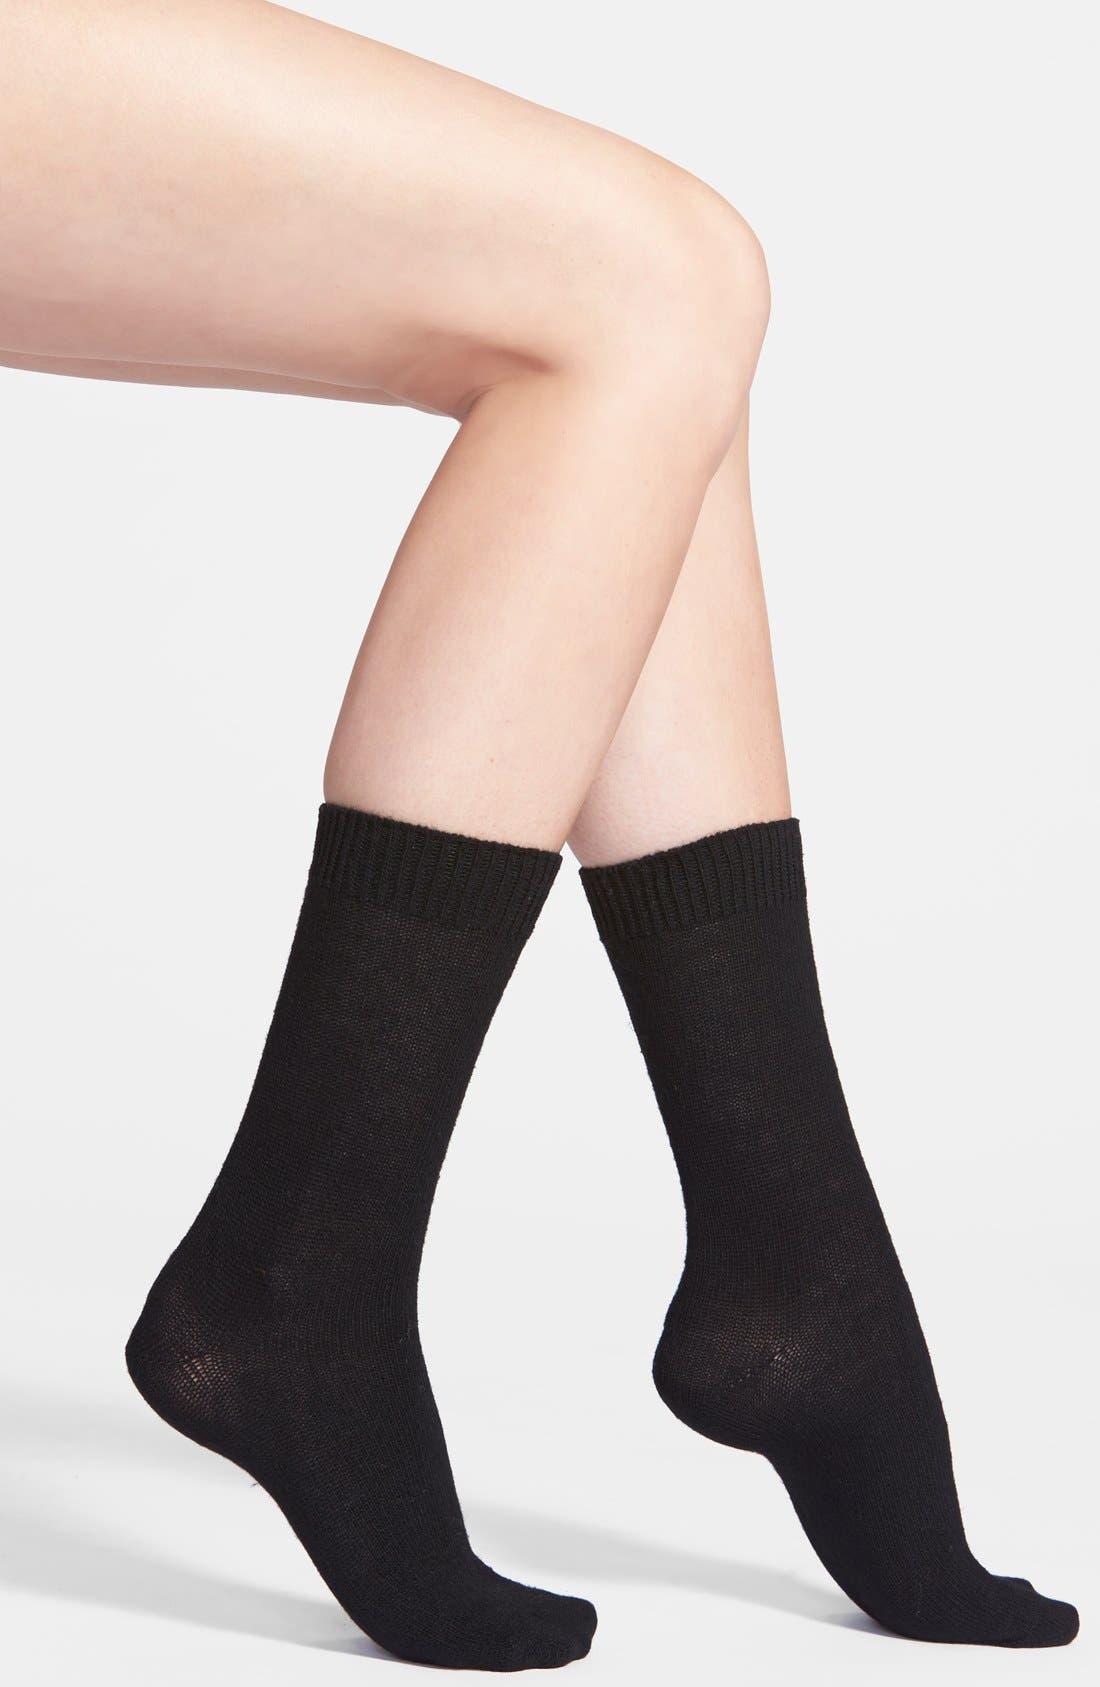 Alternate Image 1 Selected - Nordstrom 'Luxury' Crew Socks